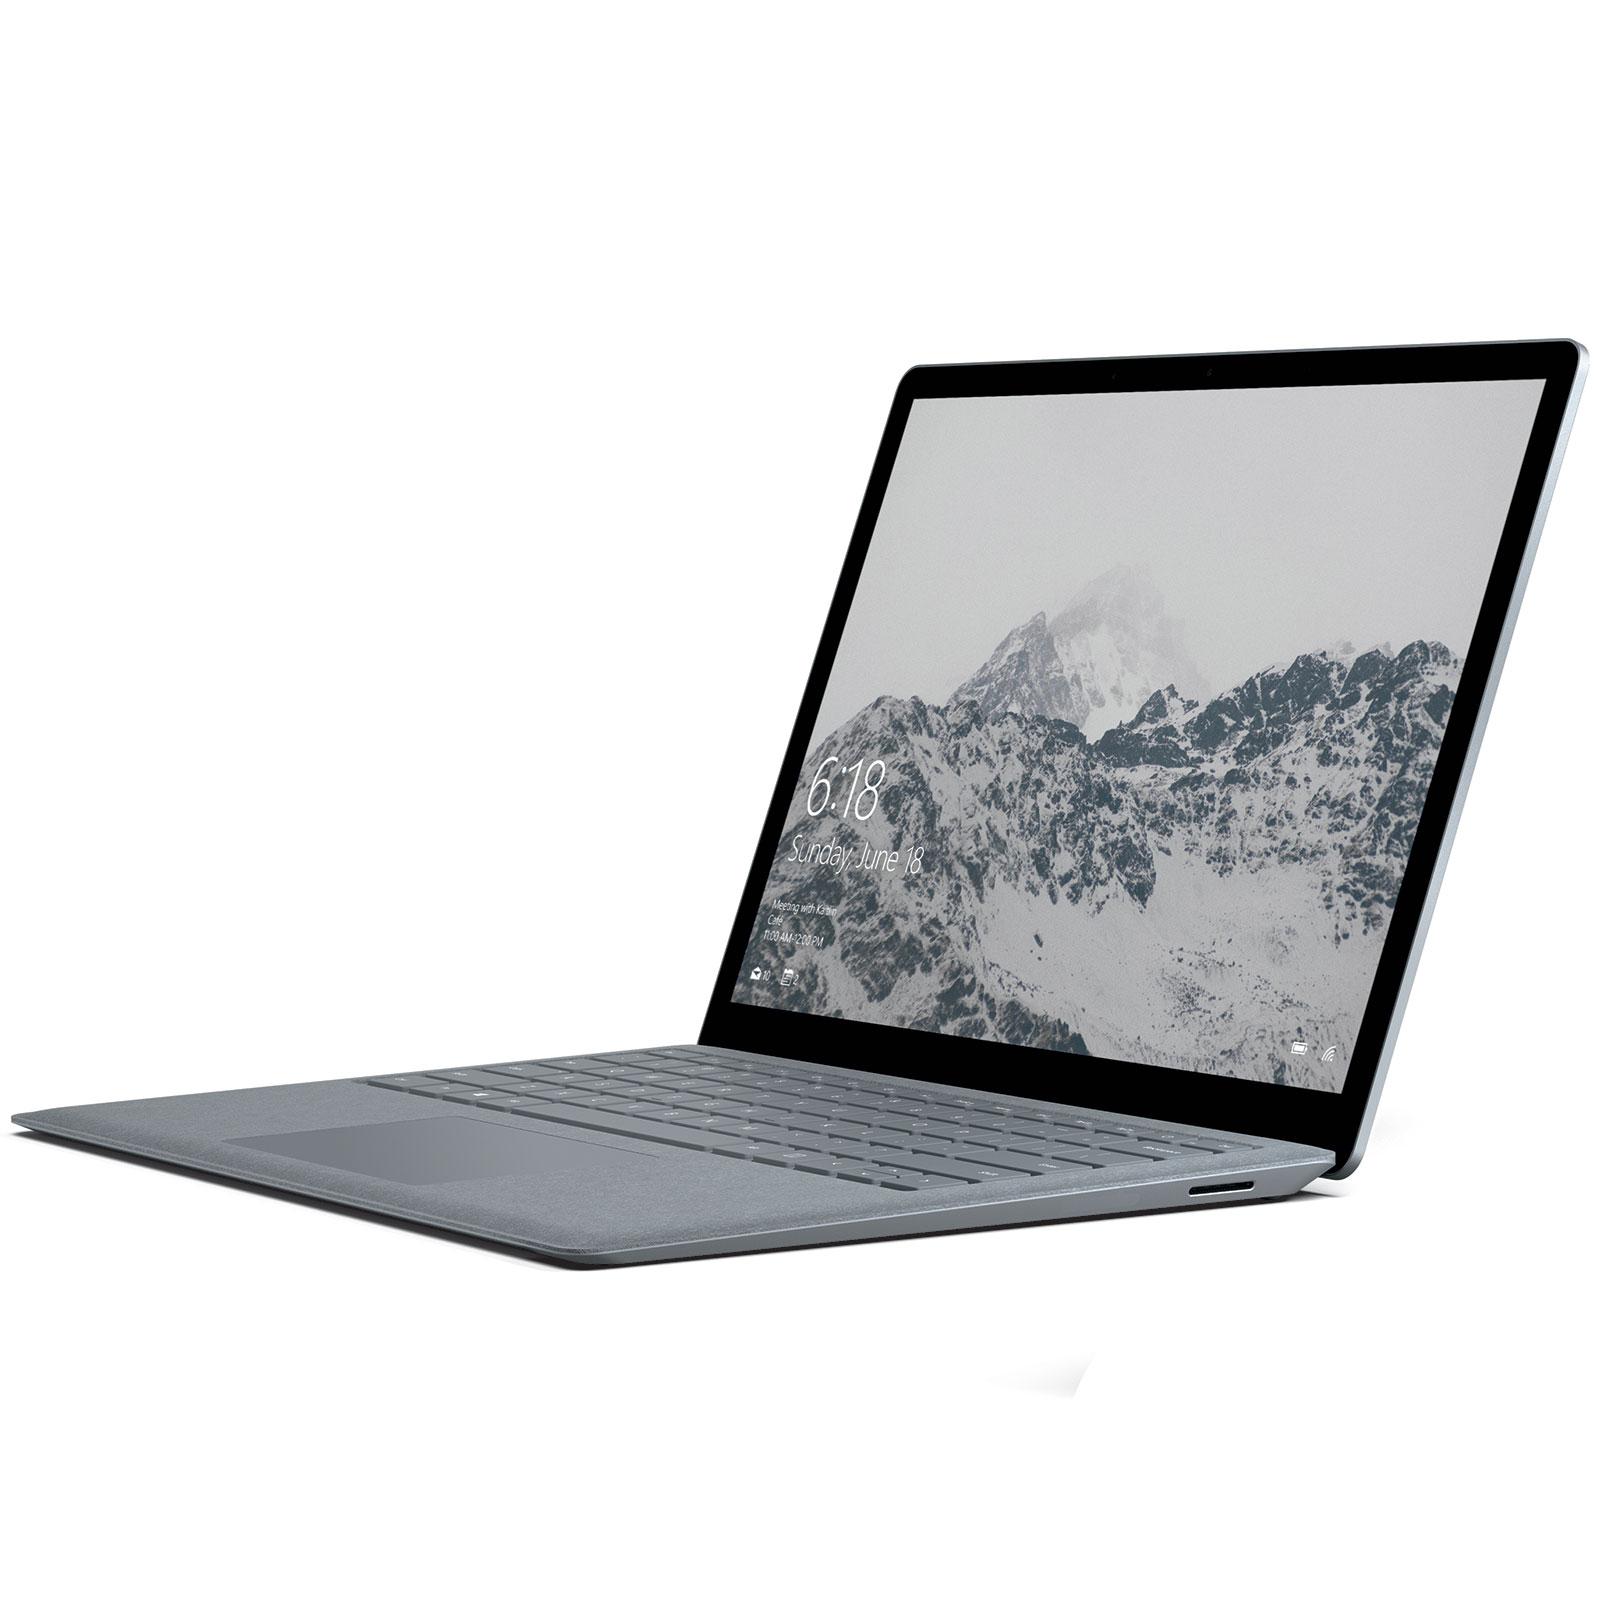 microsoft surface laptop intel core i5 4 go ssd 128 go pc portable microsoft sur. Black Bedroom Furniture Sets. Home Design Ideas